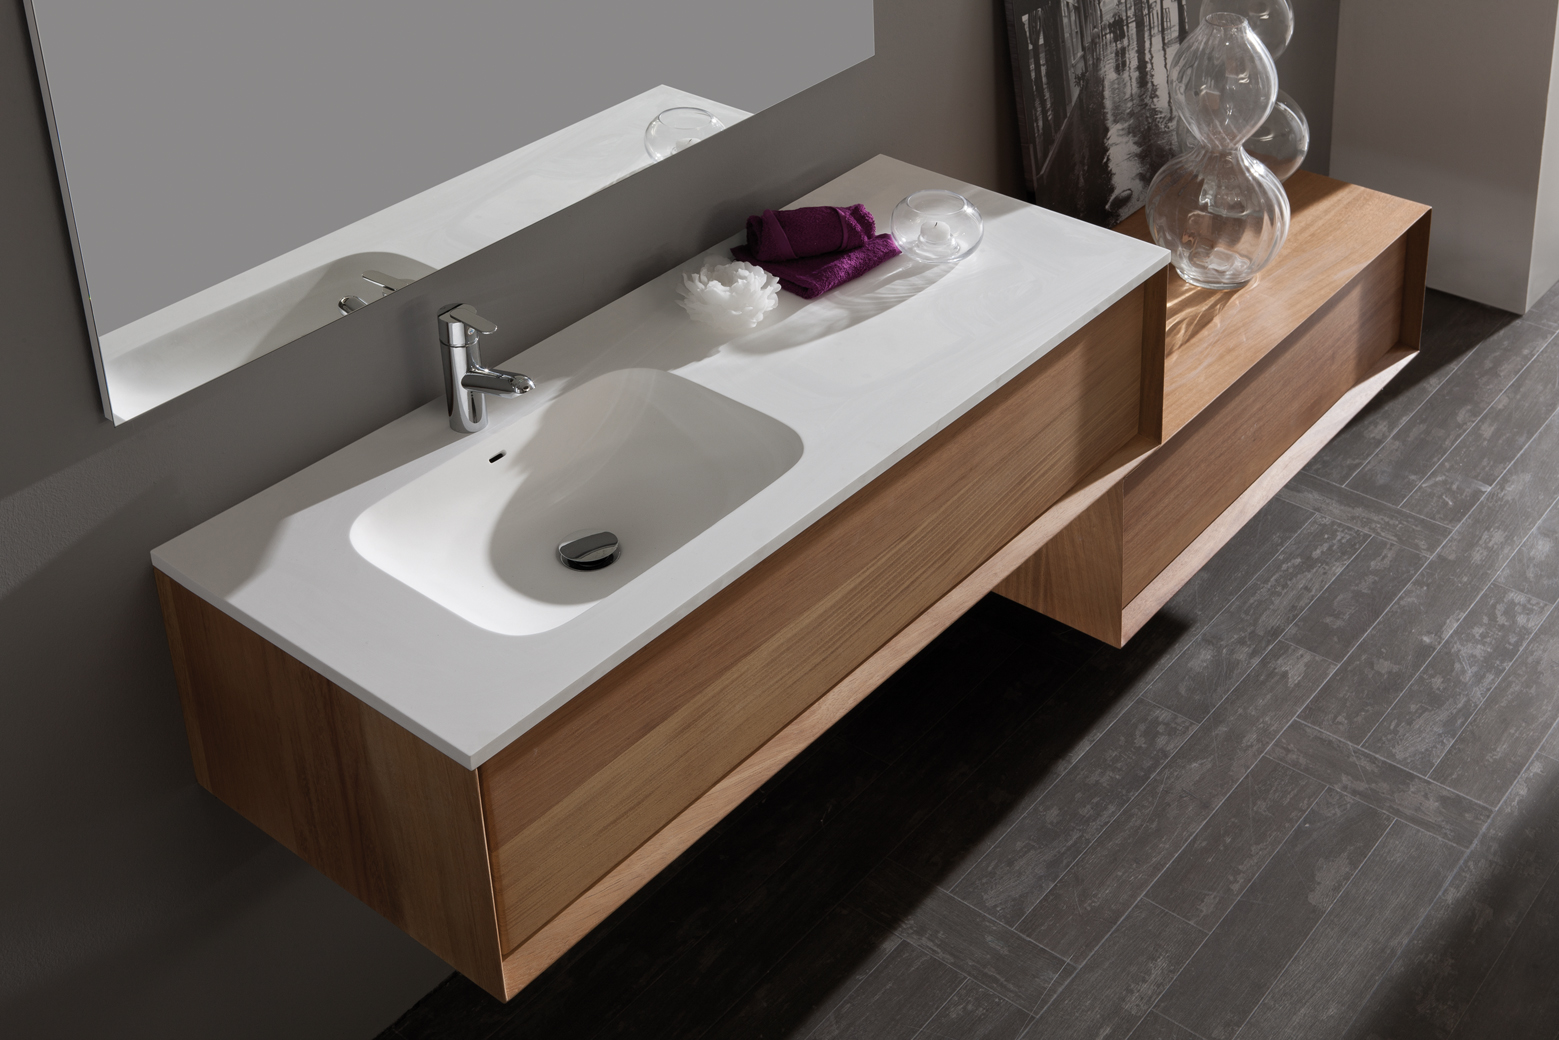 Naxani salle de bain design   aquabains